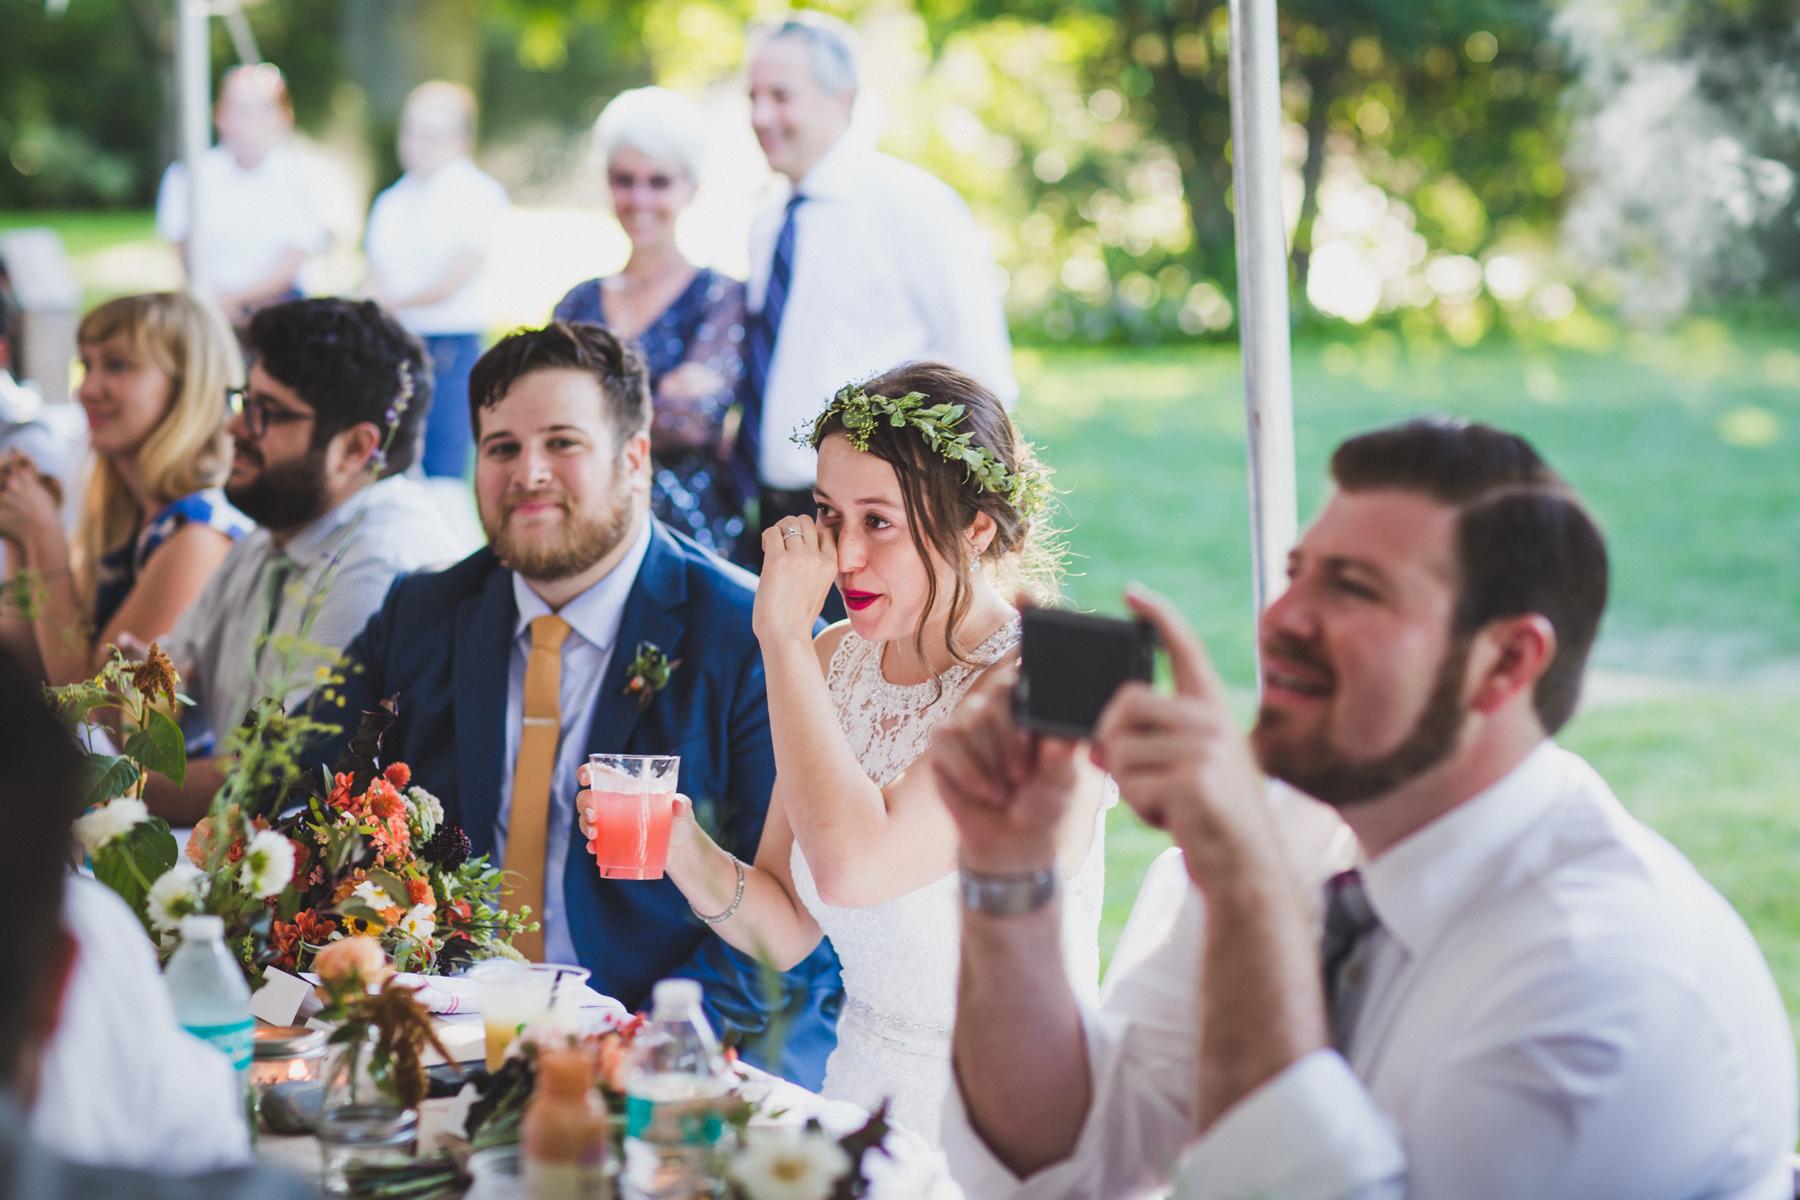 Long-Island-Documentary-Wedding-Photography-Summer-Tent-Wedding-in-New-York-118.jpg